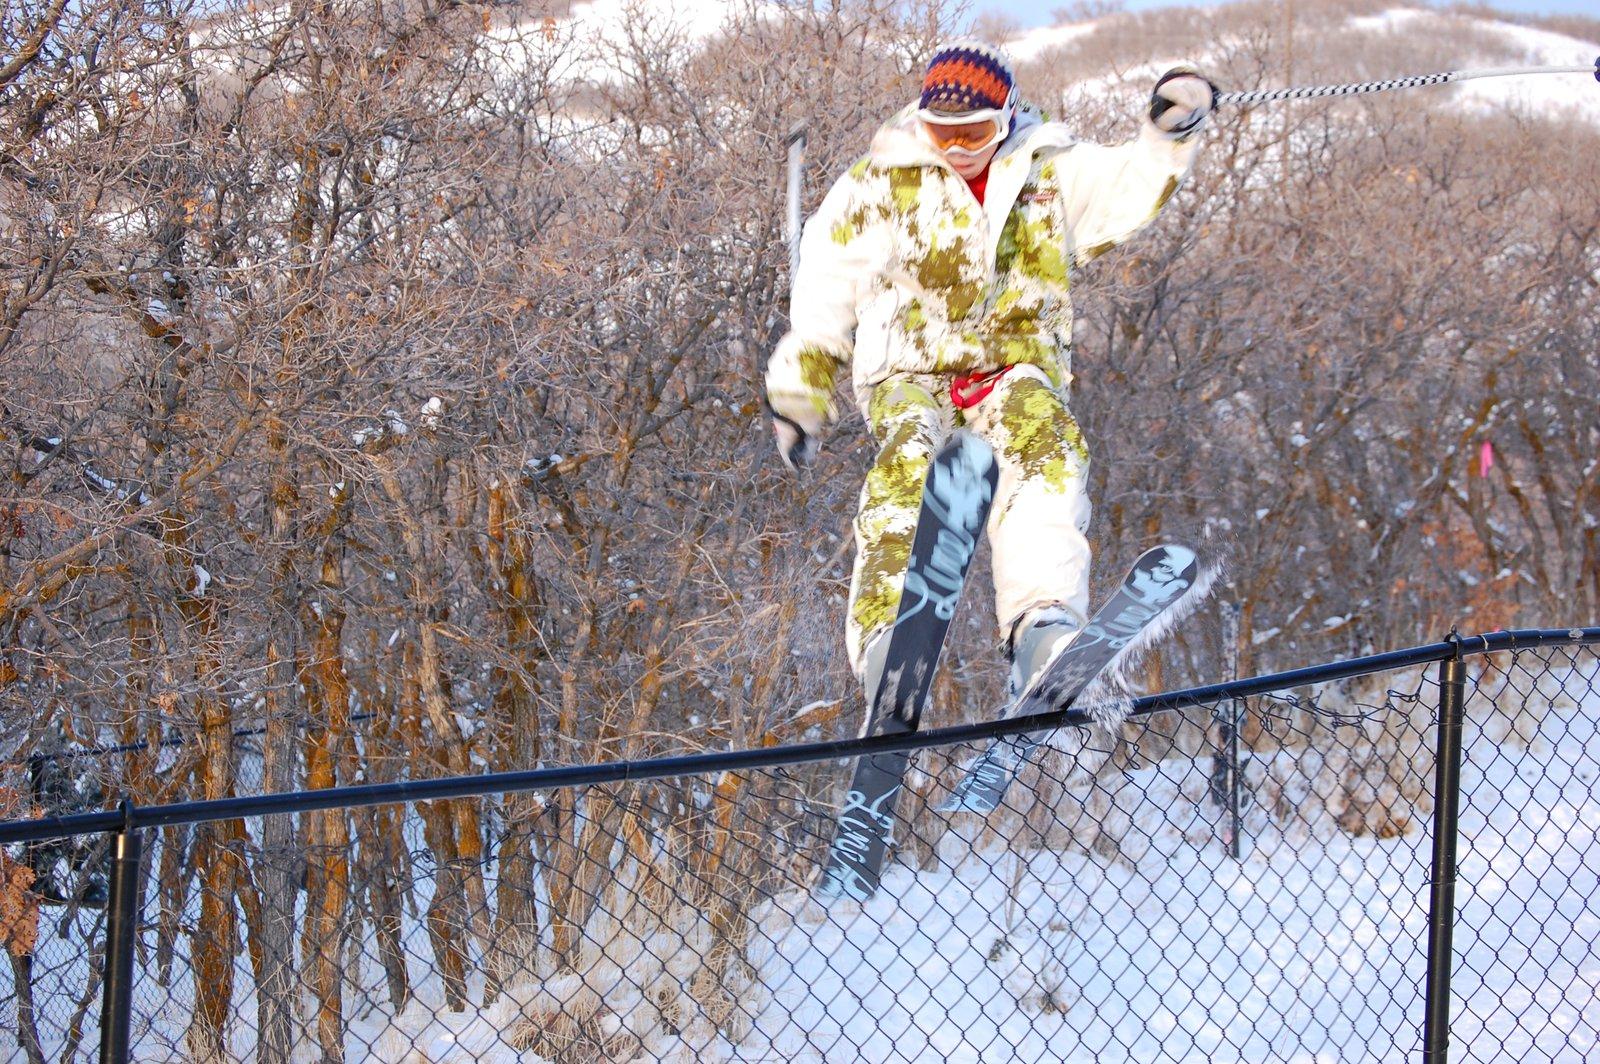 Fence Jibbin